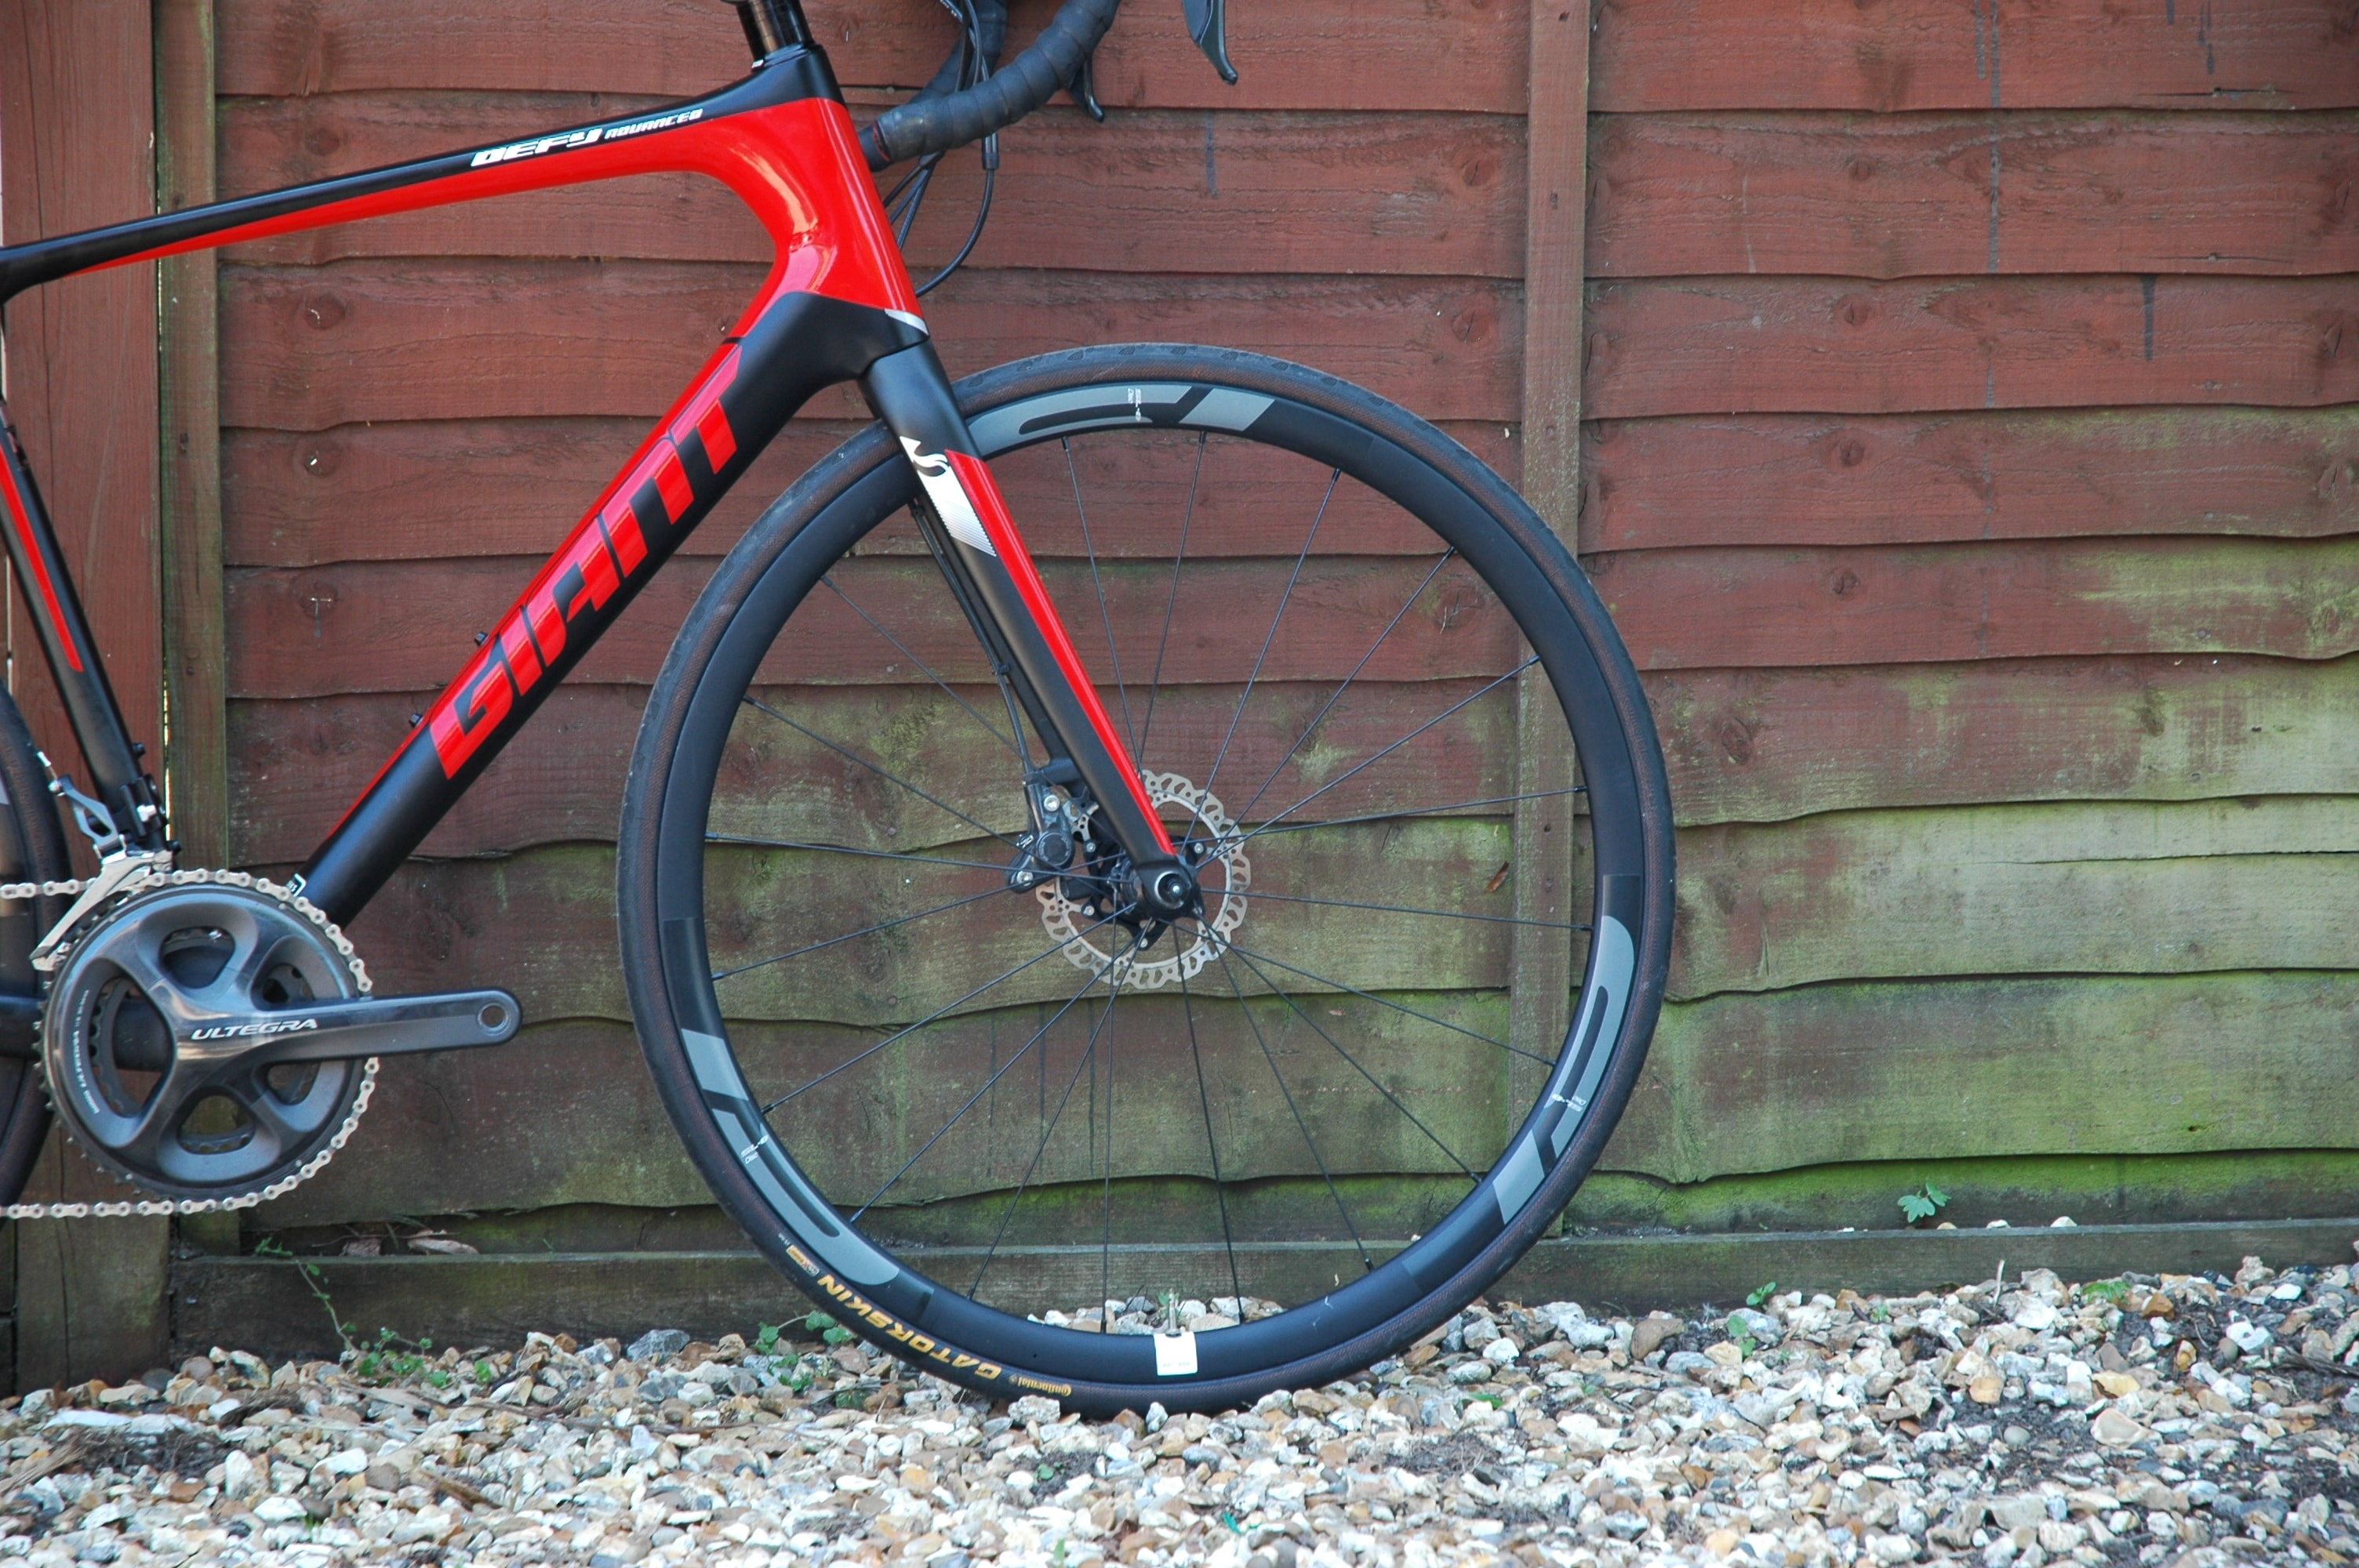 64b25c5eb6e SOLD - Used Bike - Giant Defy Advanced Pro 1 2015 - ML - £1199